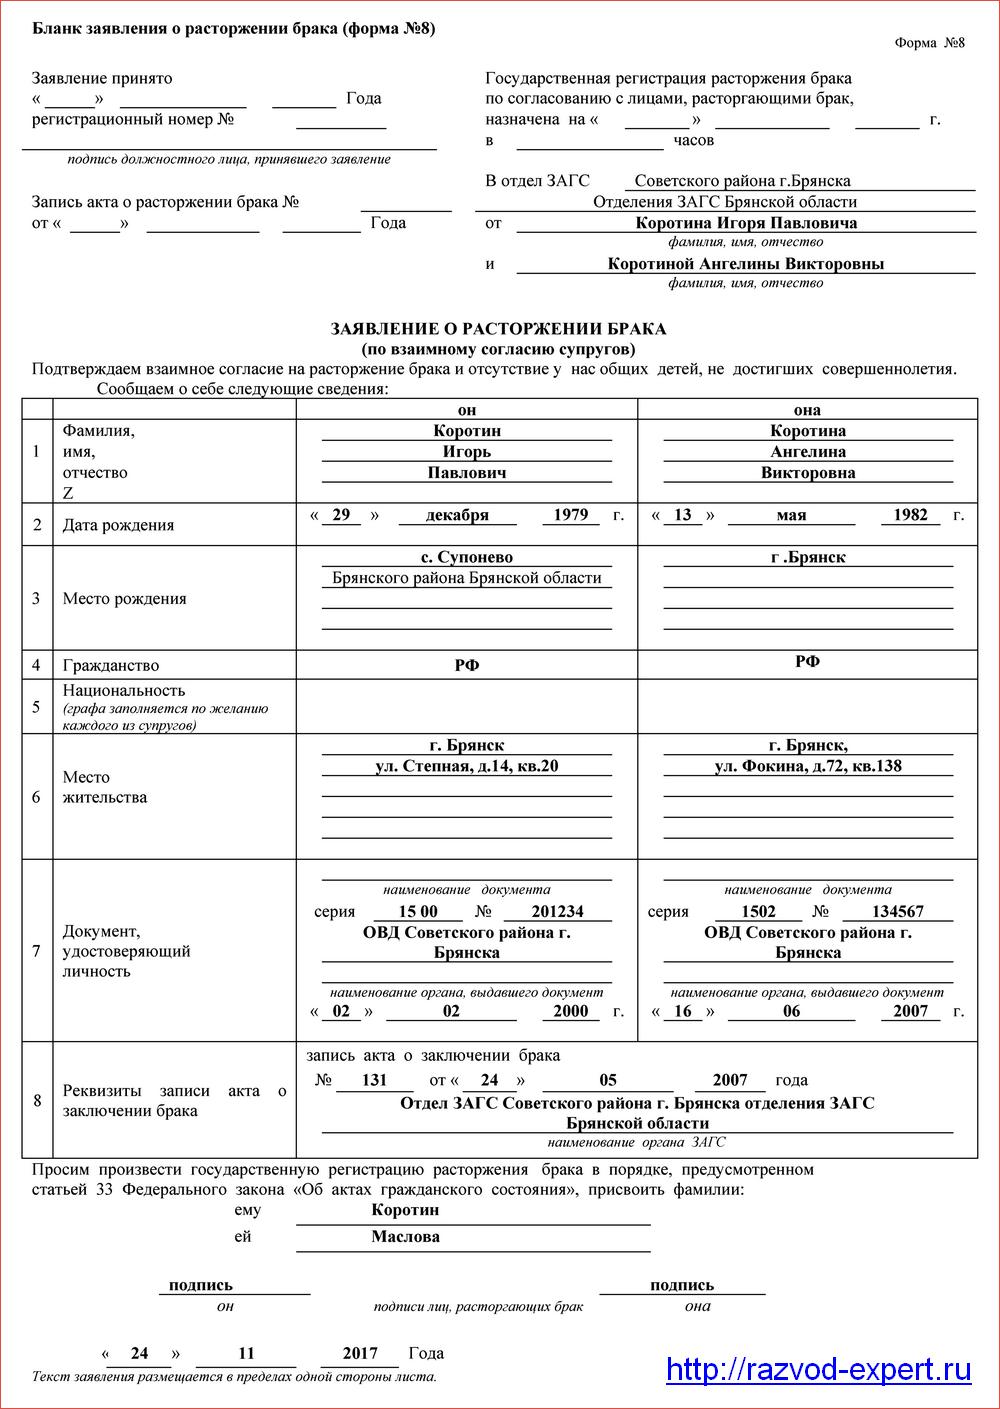 mozhno-li-podat-na-razvod-cherez-mfcz-2